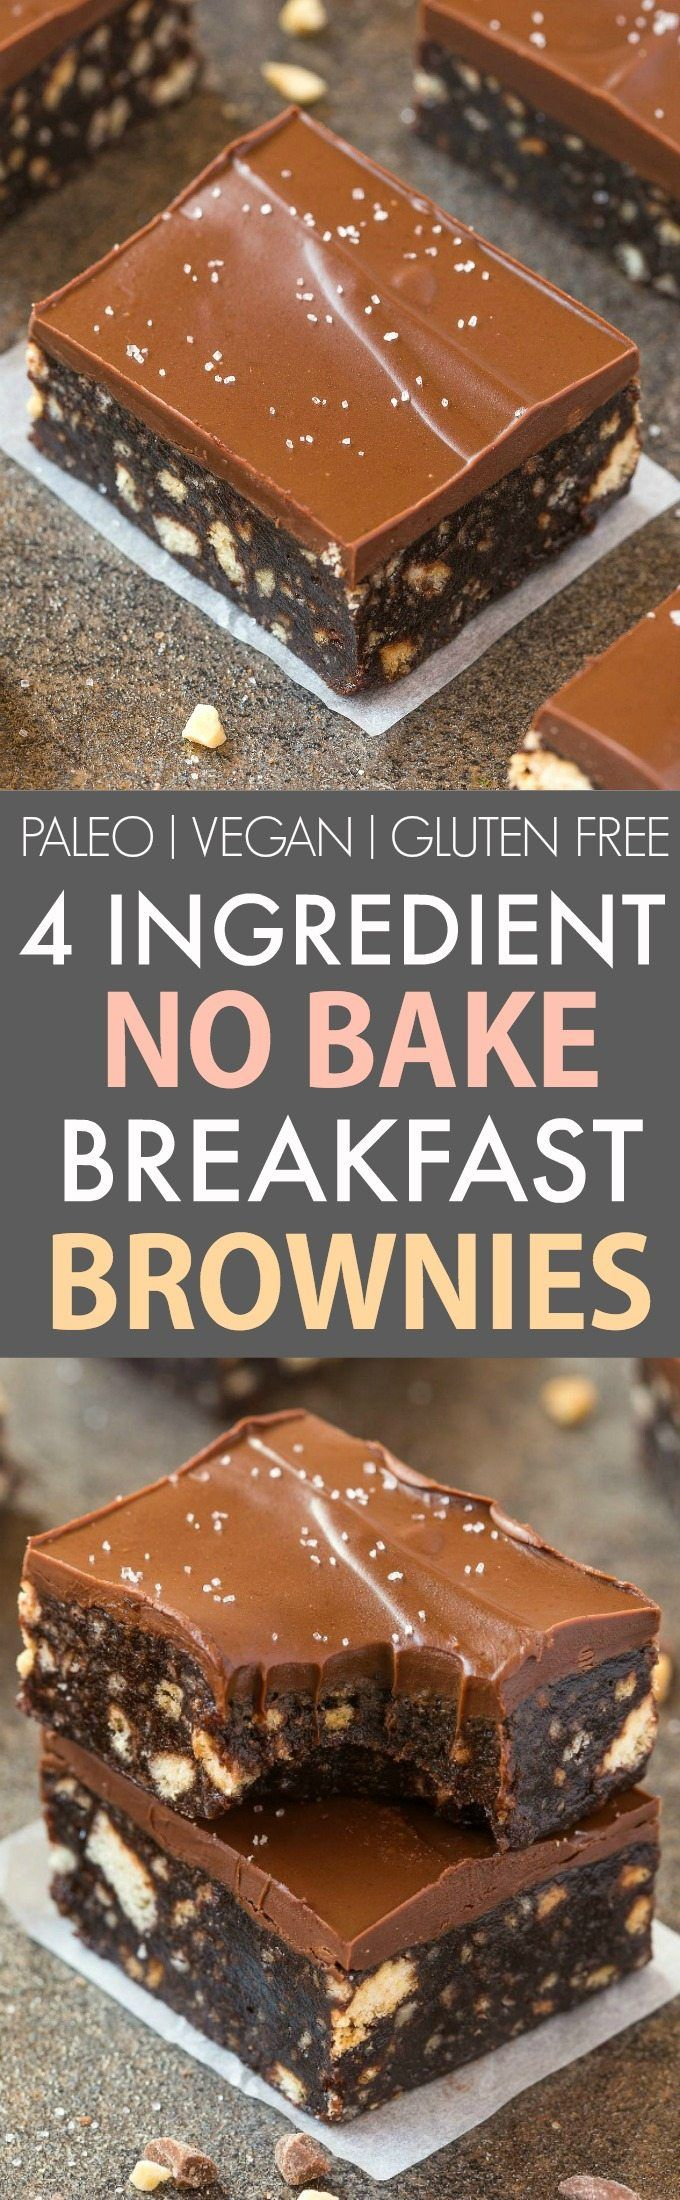 4 Ingredient No Bake Flourless Breakfast Brownies (Paleo, Vegan, Gluten Free)